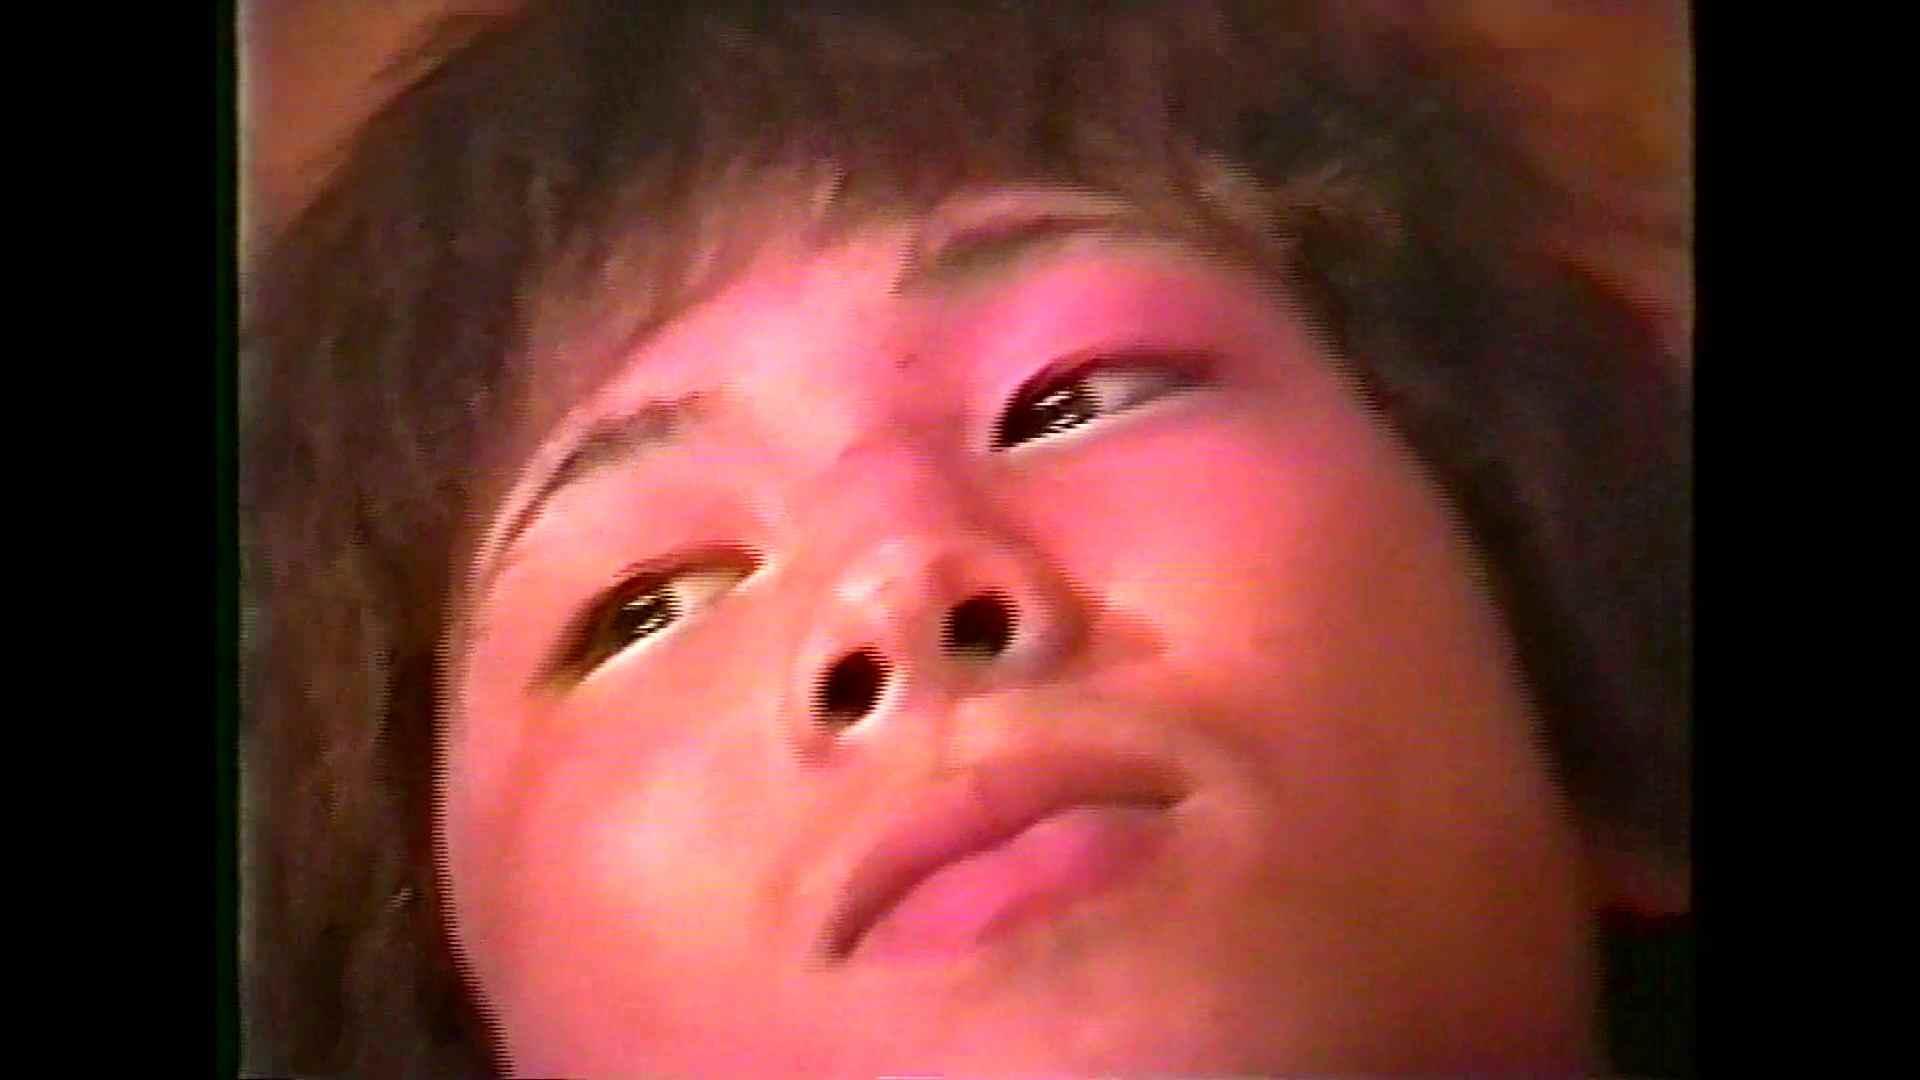 GAYBOY宏のオカズ倉庫Vol.3-4 ゲイのペニス ゲイフリーエロ画像 73枚 10